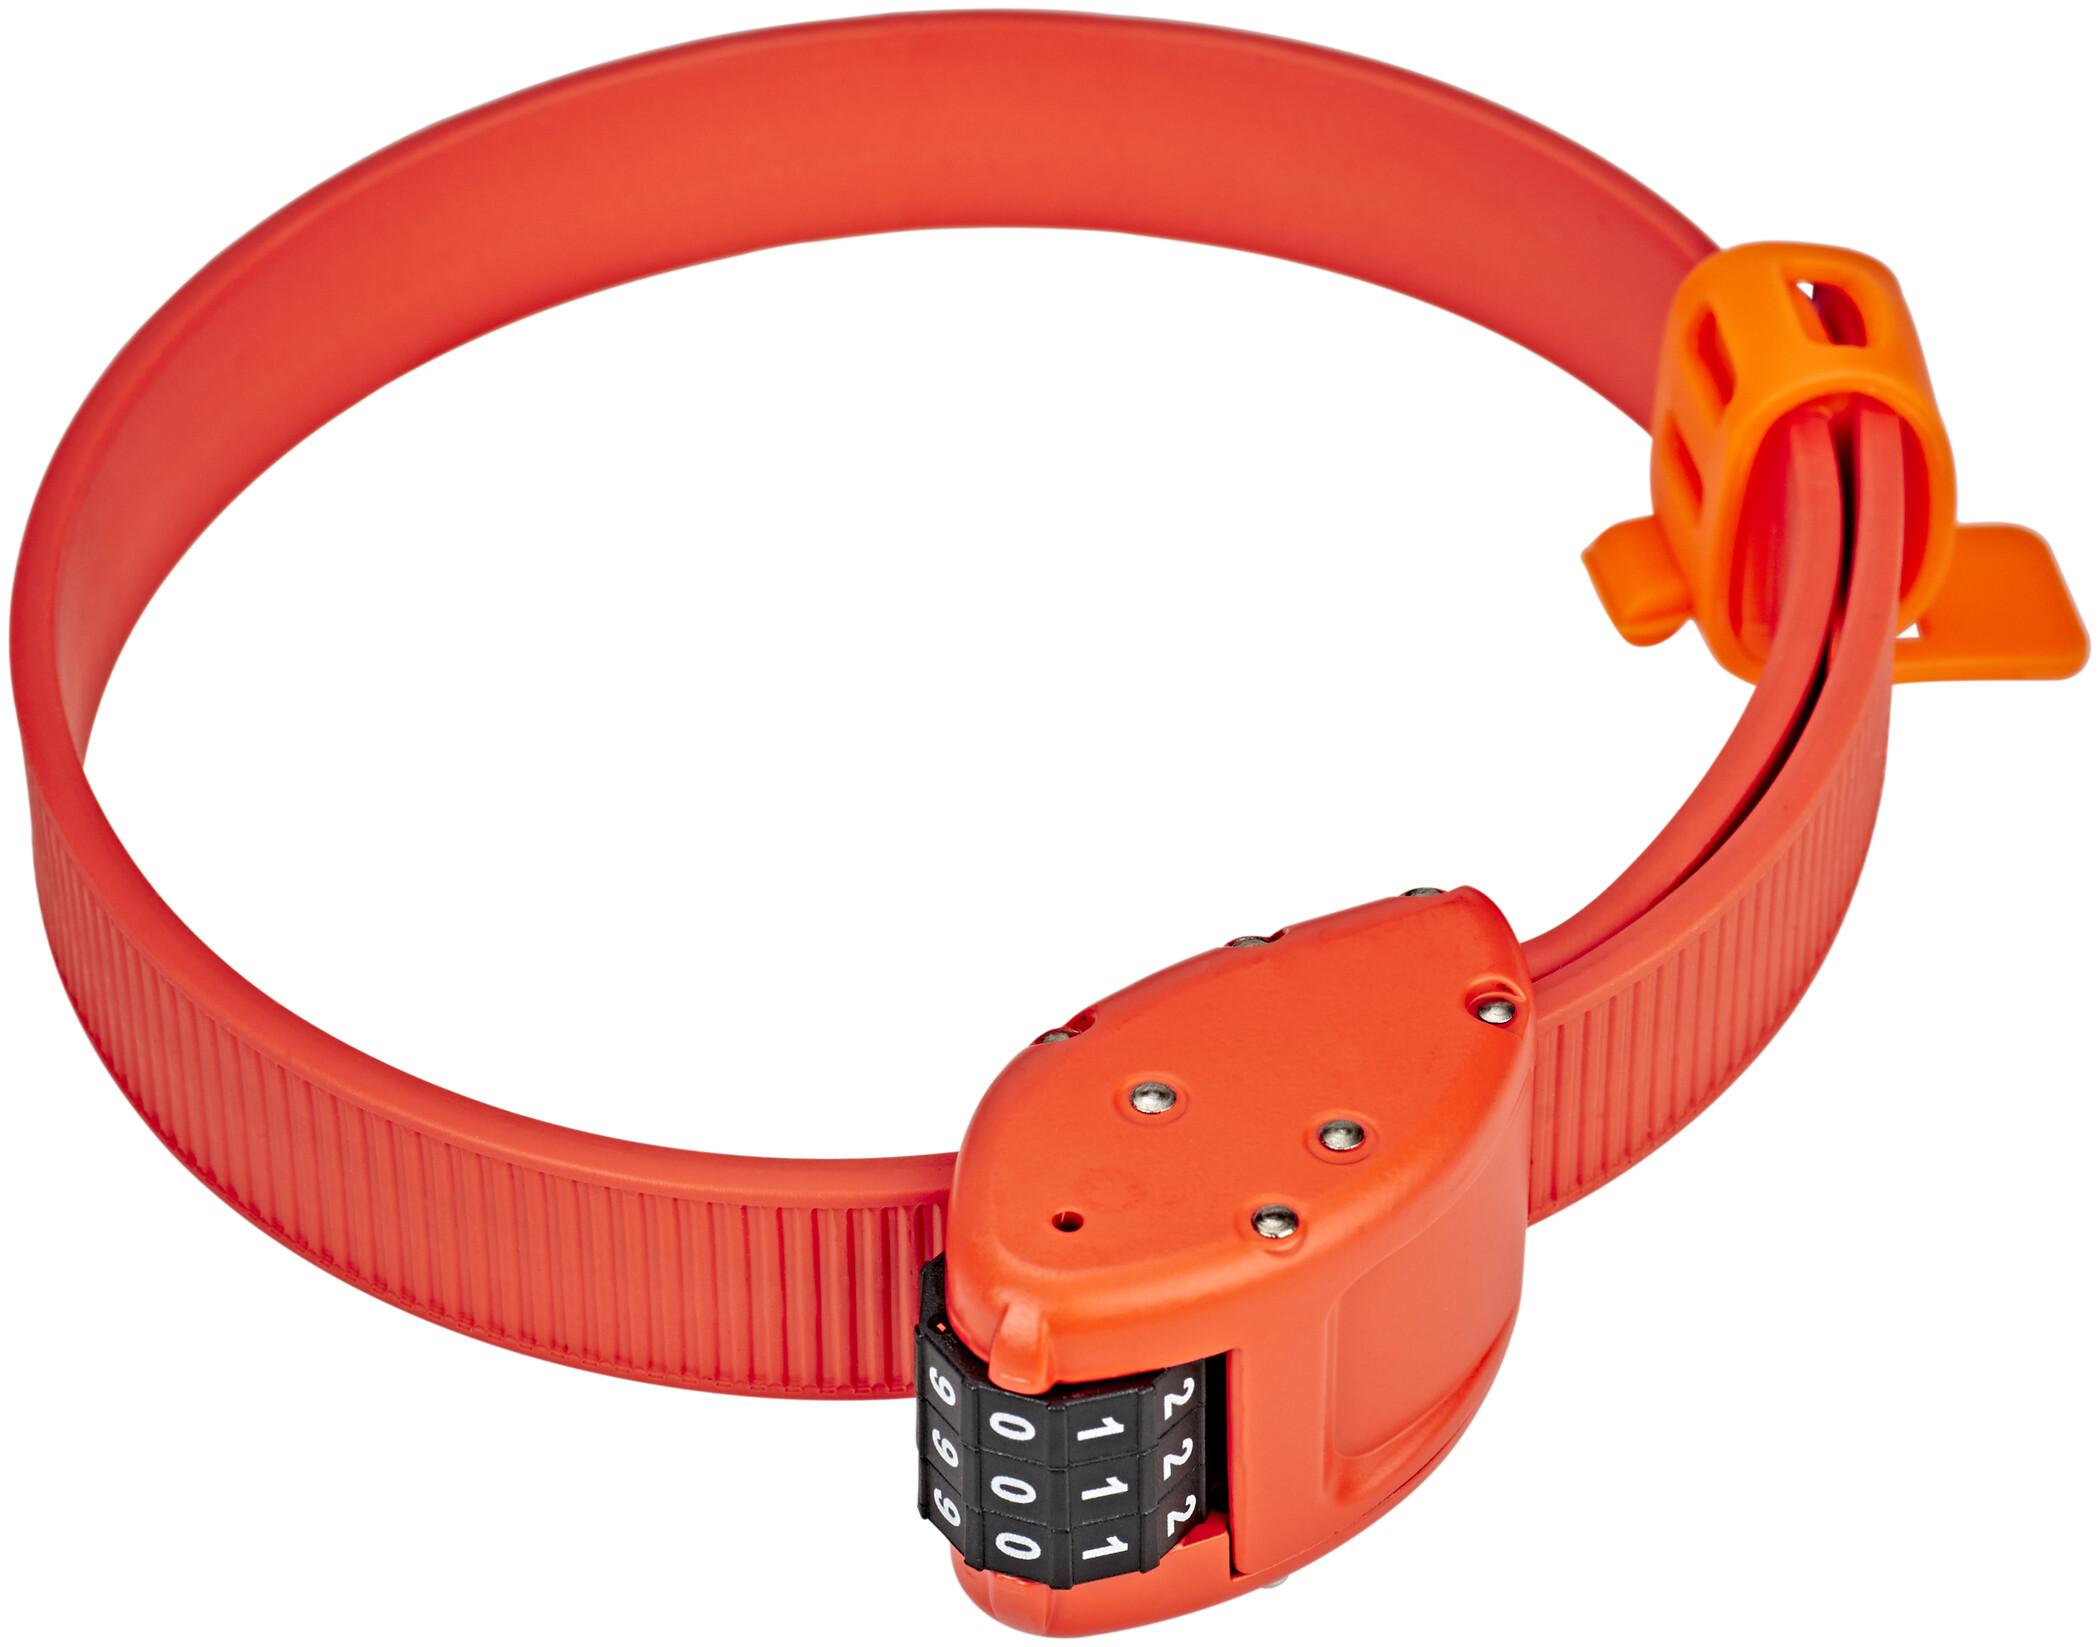 OTTOLOCK Cinch Lock 45 cm, otto orange | Løse låse